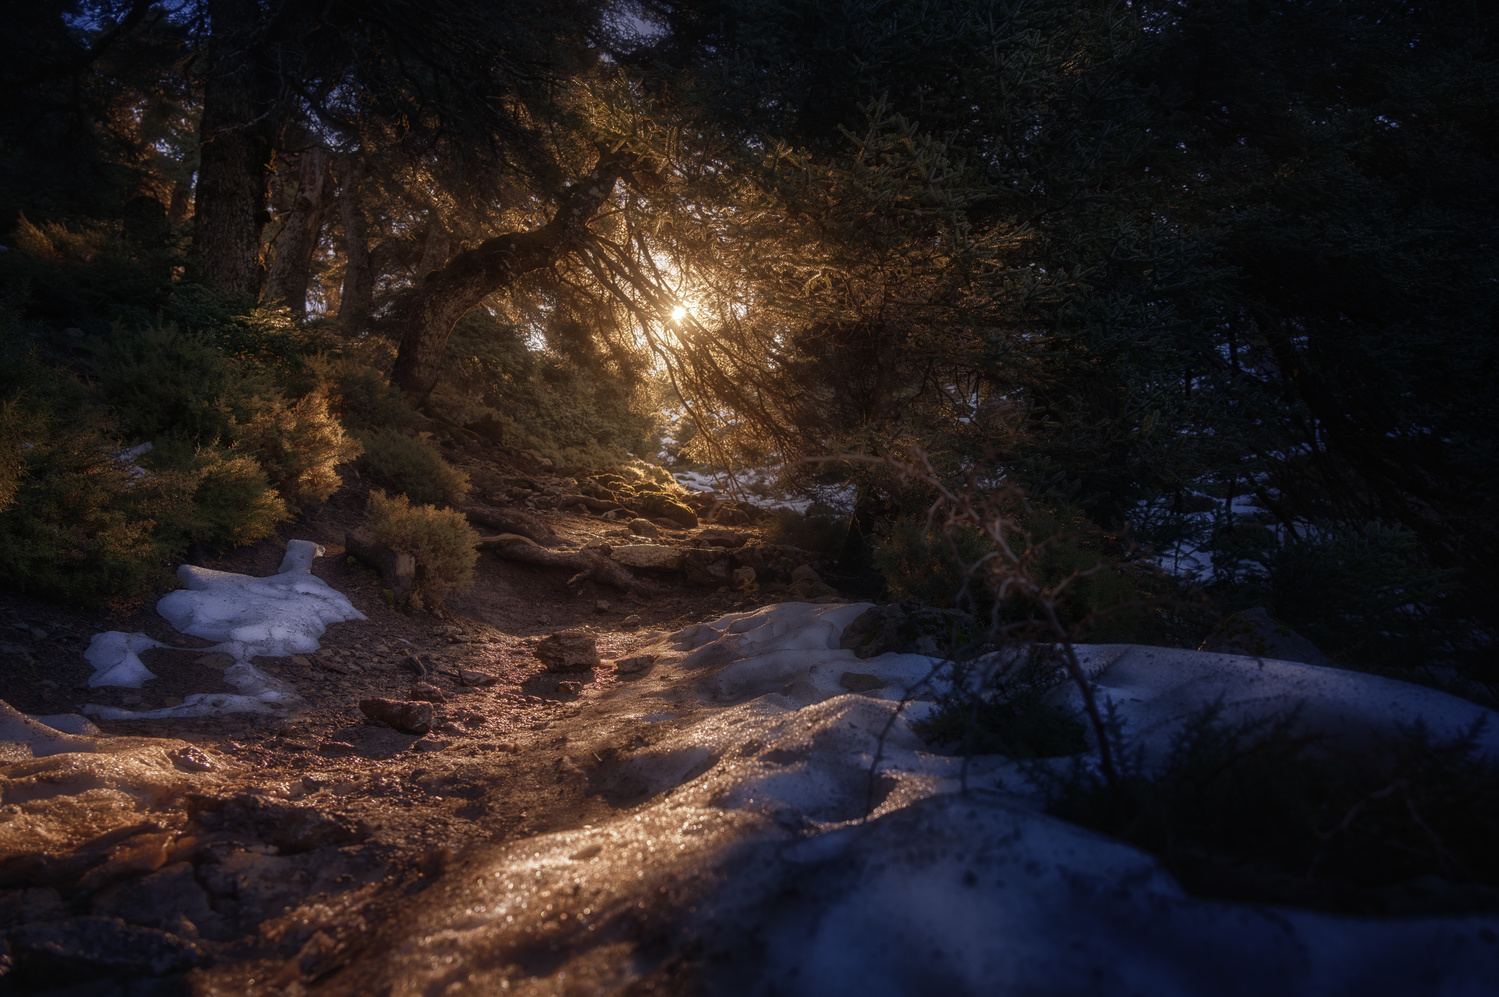 Sunrise after a snowfall in the Sierra de las Nieves, Málaga by DaniGviews /Daniel